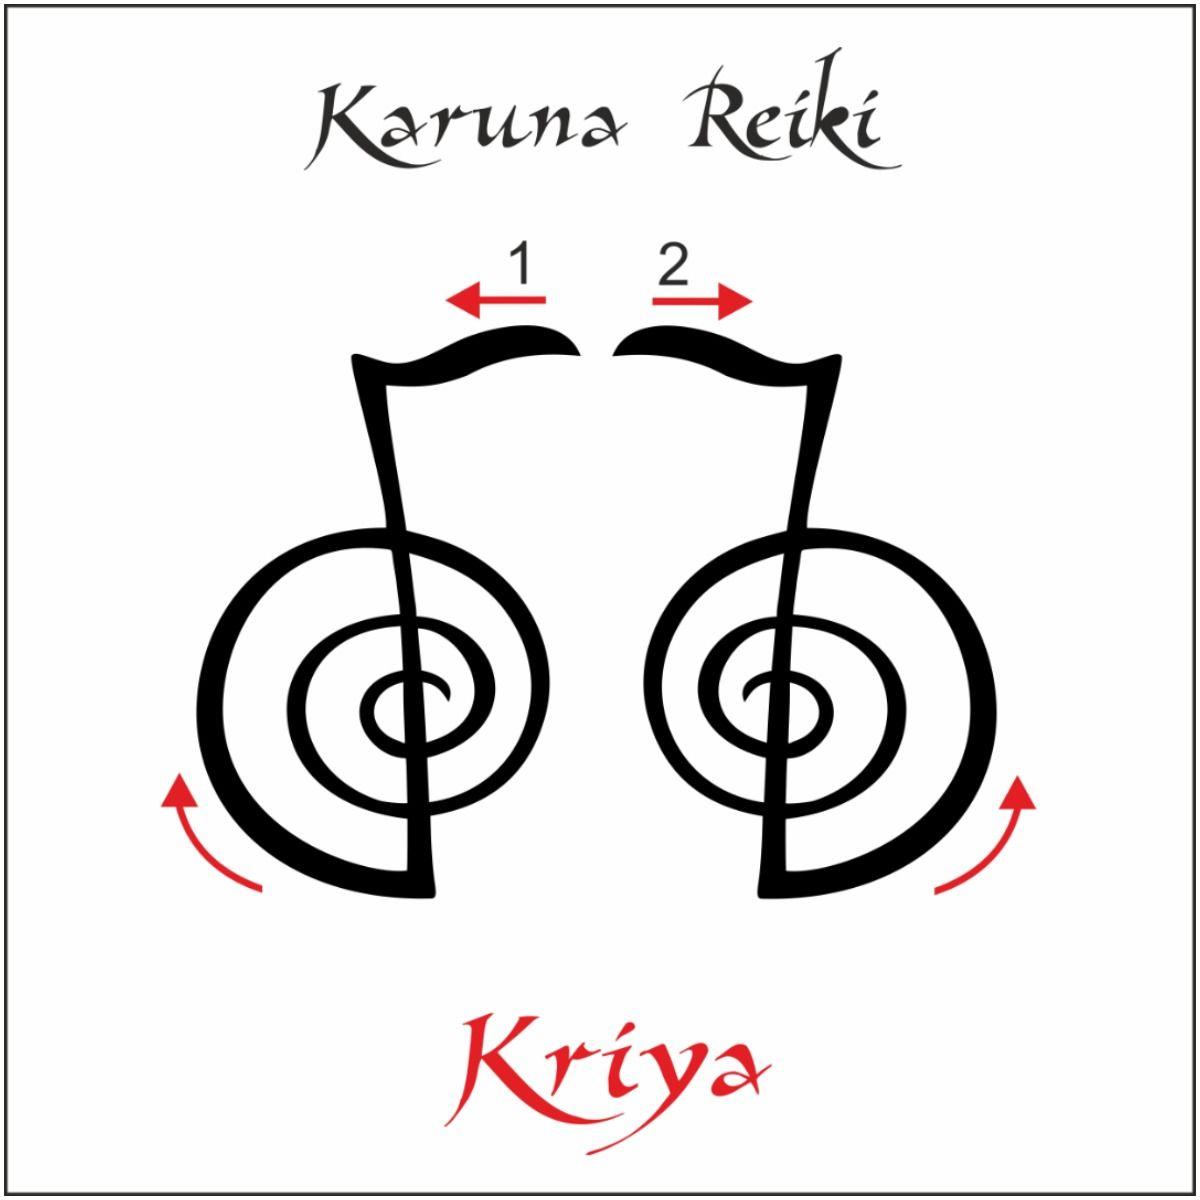 Kriya Reiki Symbol - Meaning & Uses